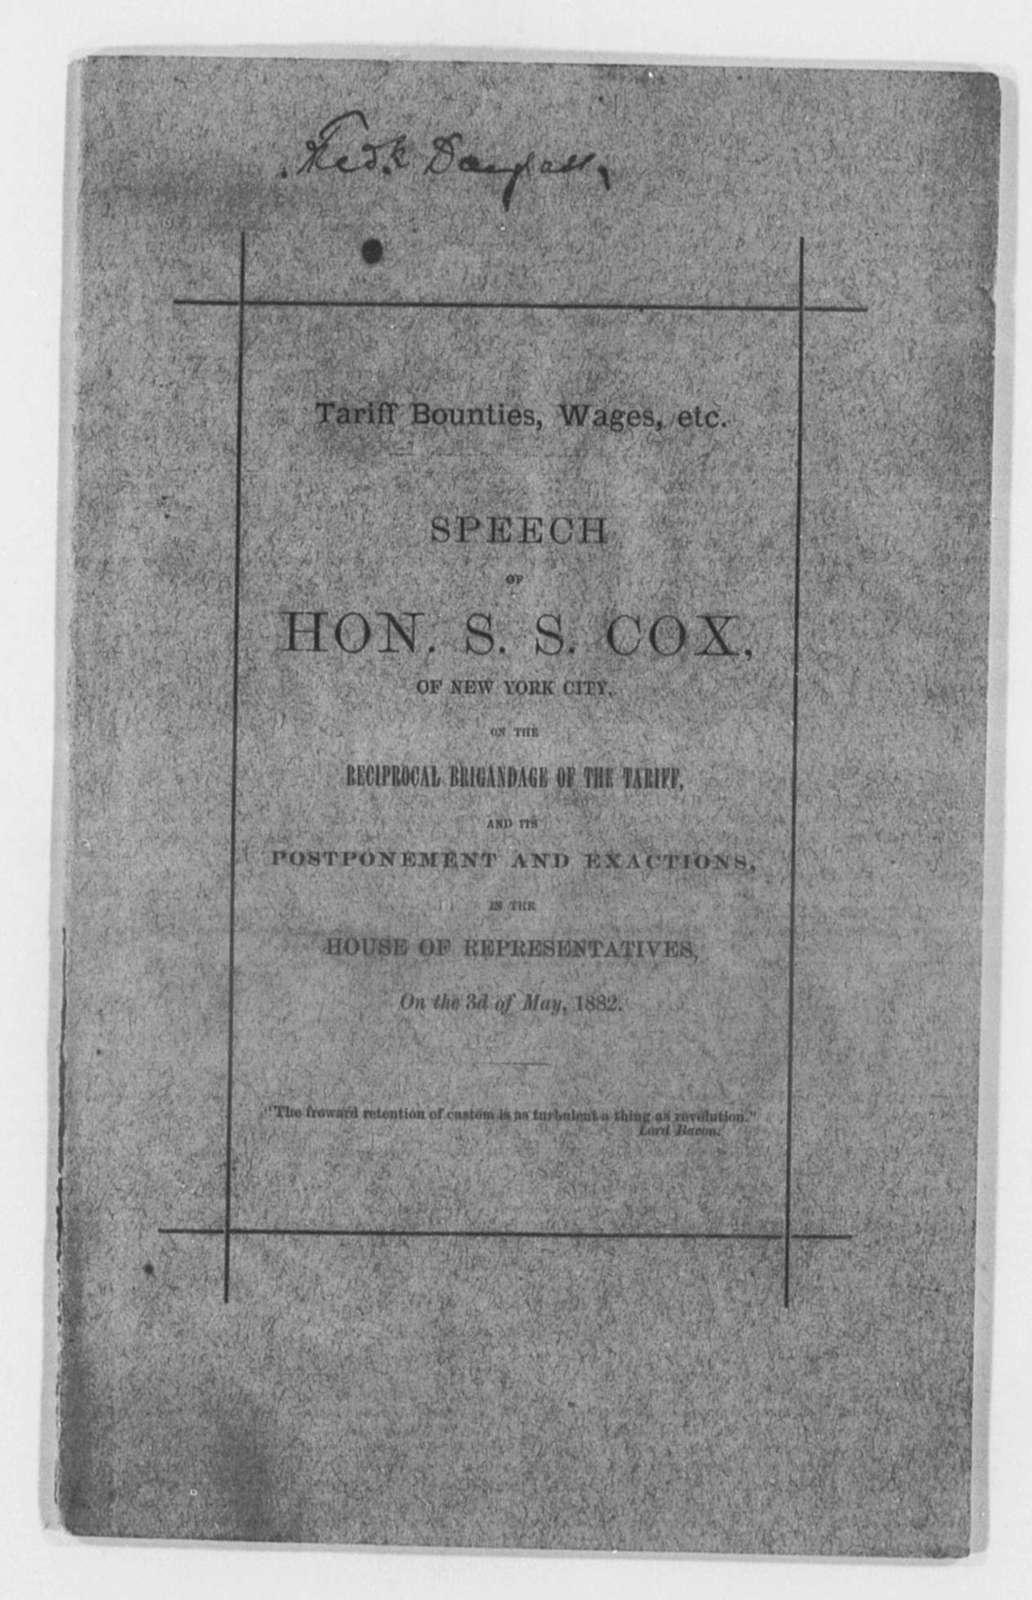 Cox, S. S. - Folder 3 of 4